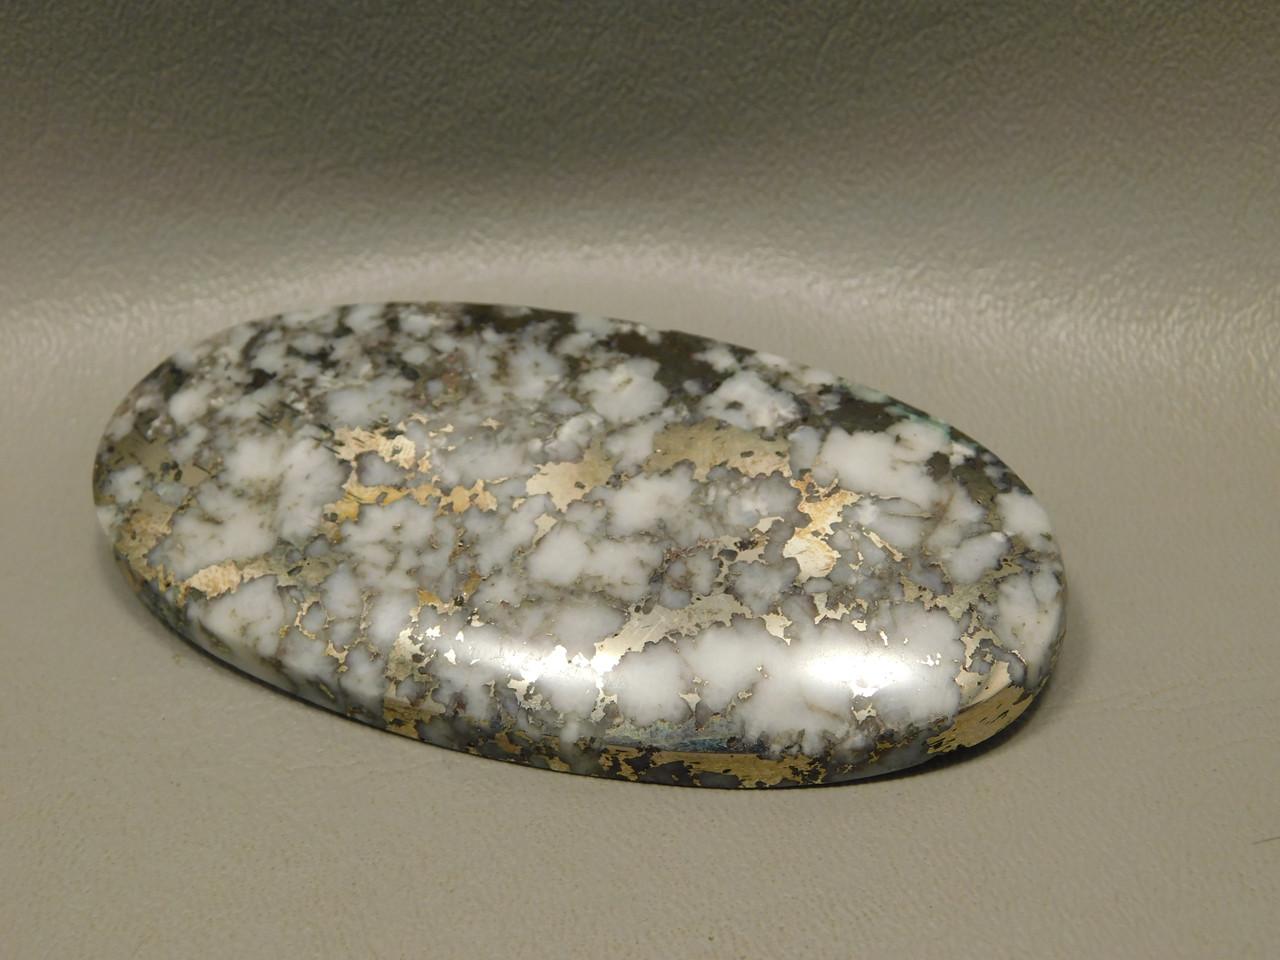 Mohawkite 3.5 inch Large Collector Designer Cabochon Stone #XL2